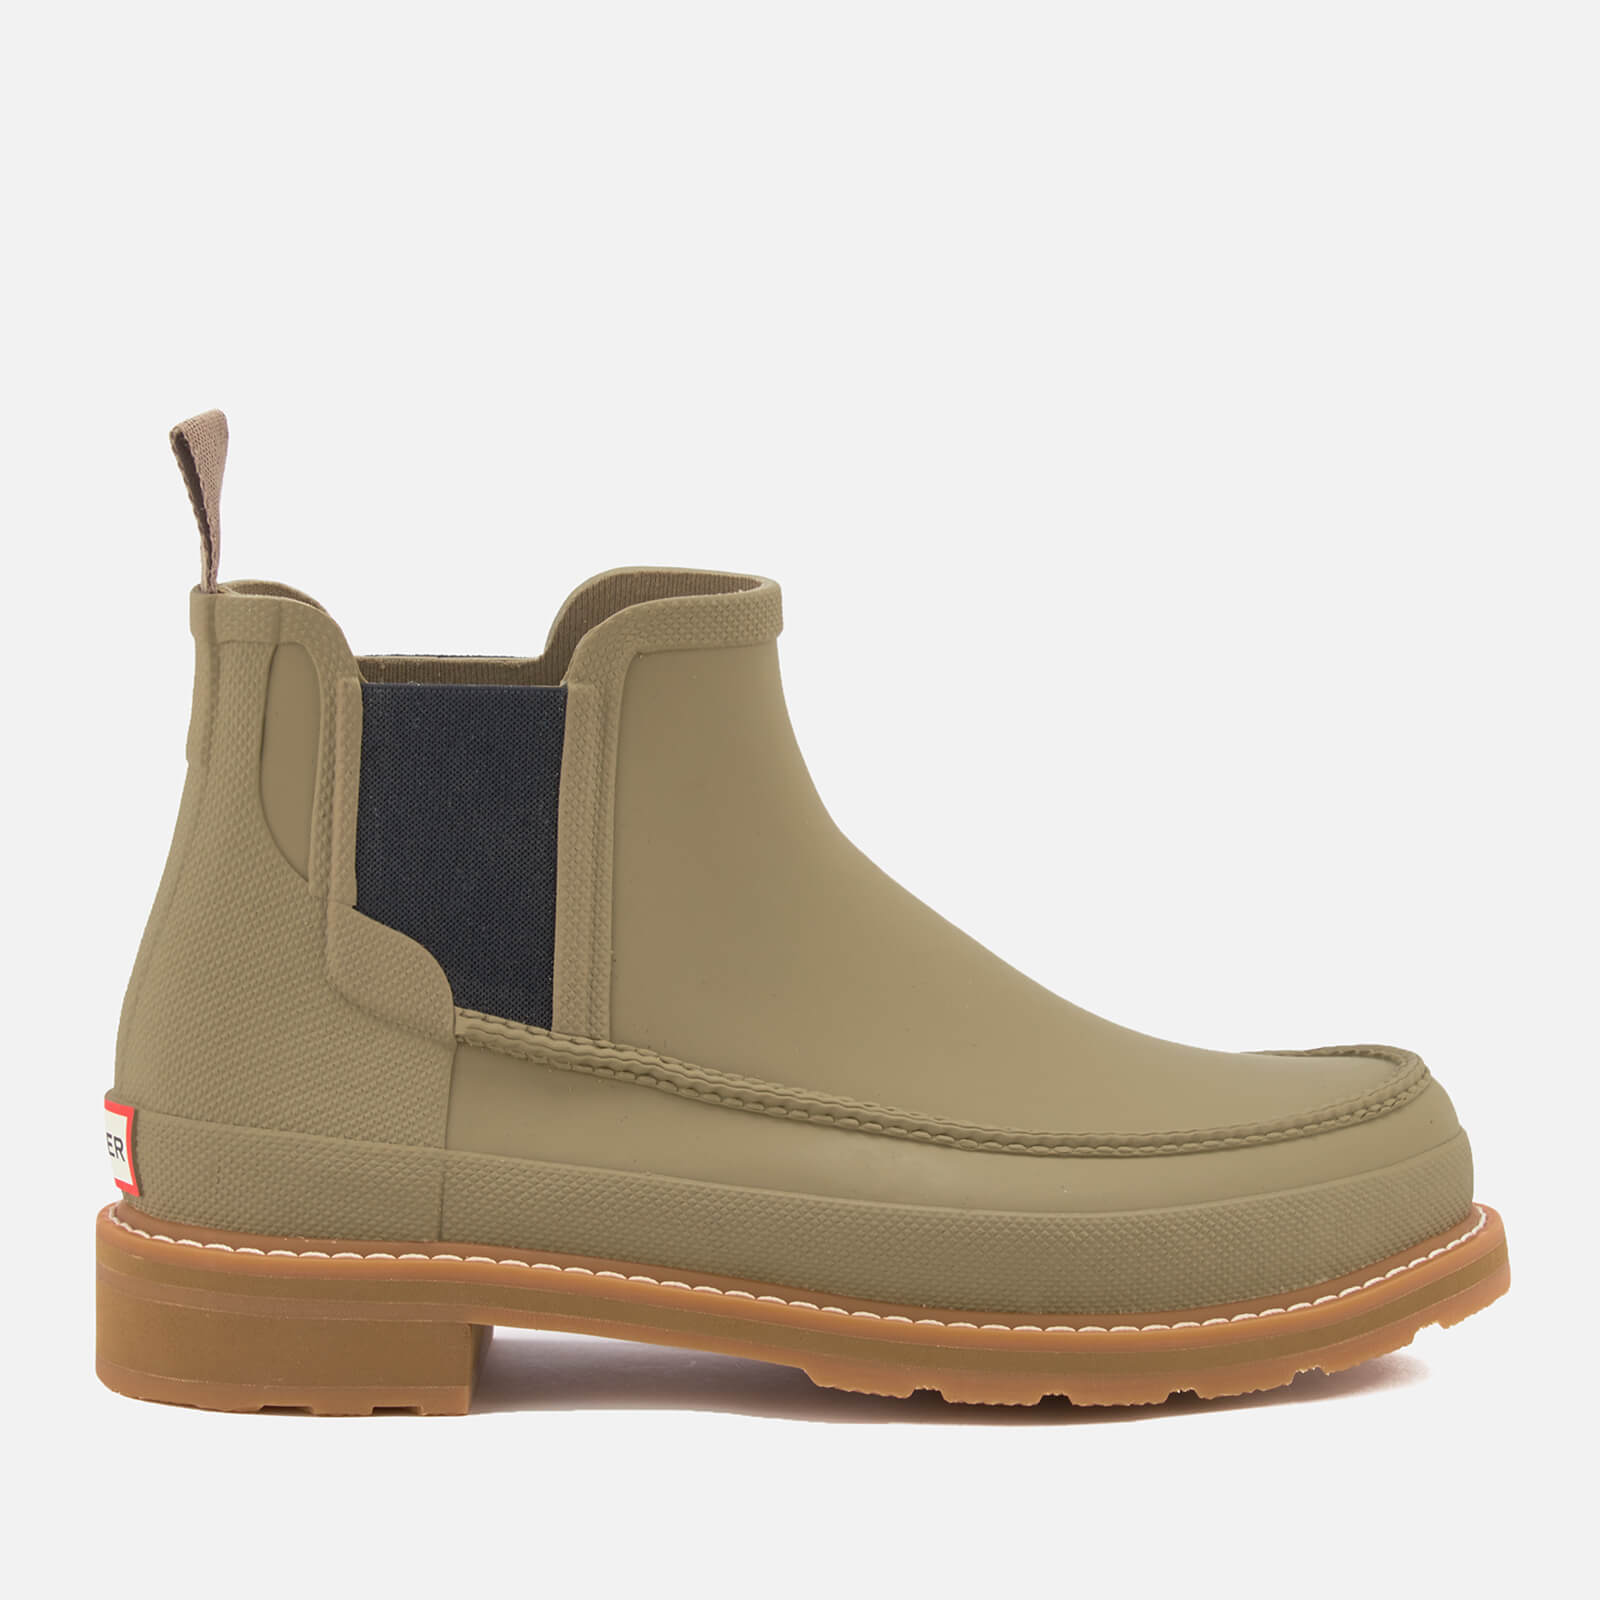 0c4fd2e8e8f Hunter Men's Lightweight Moc Toe Chelsea Boots - Salvia